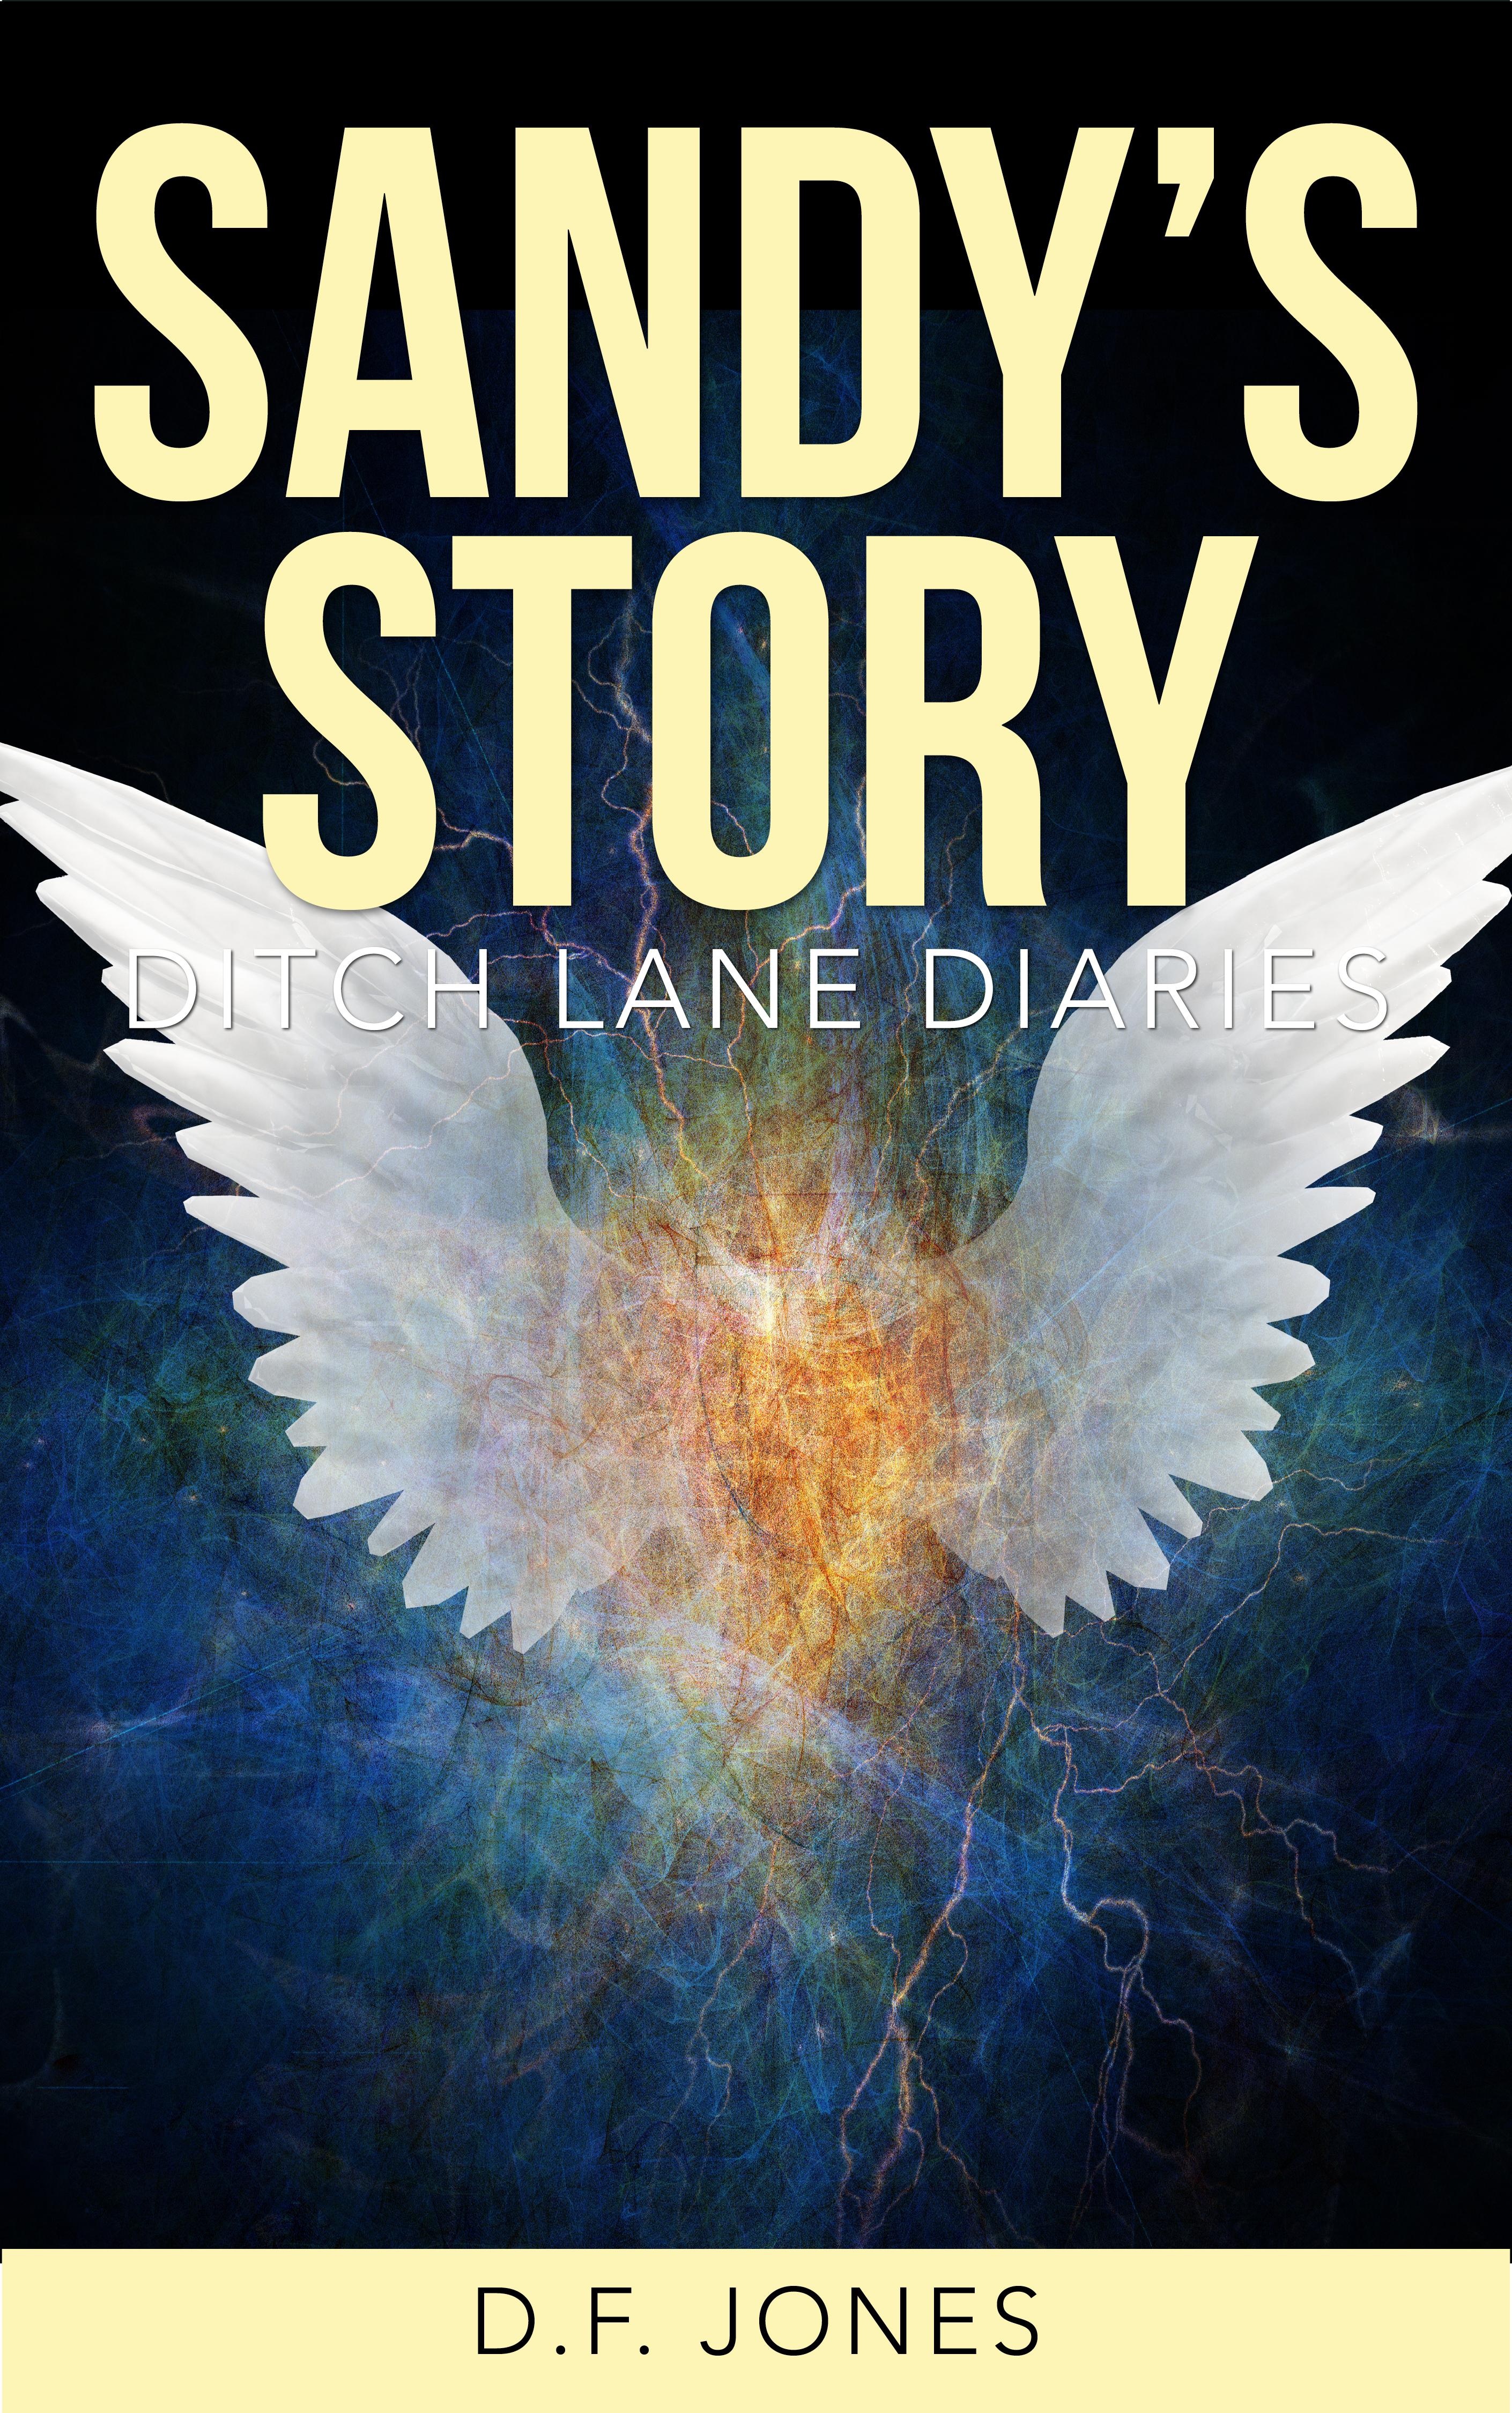 Murfreesboro author D.F. Jones has released a new book